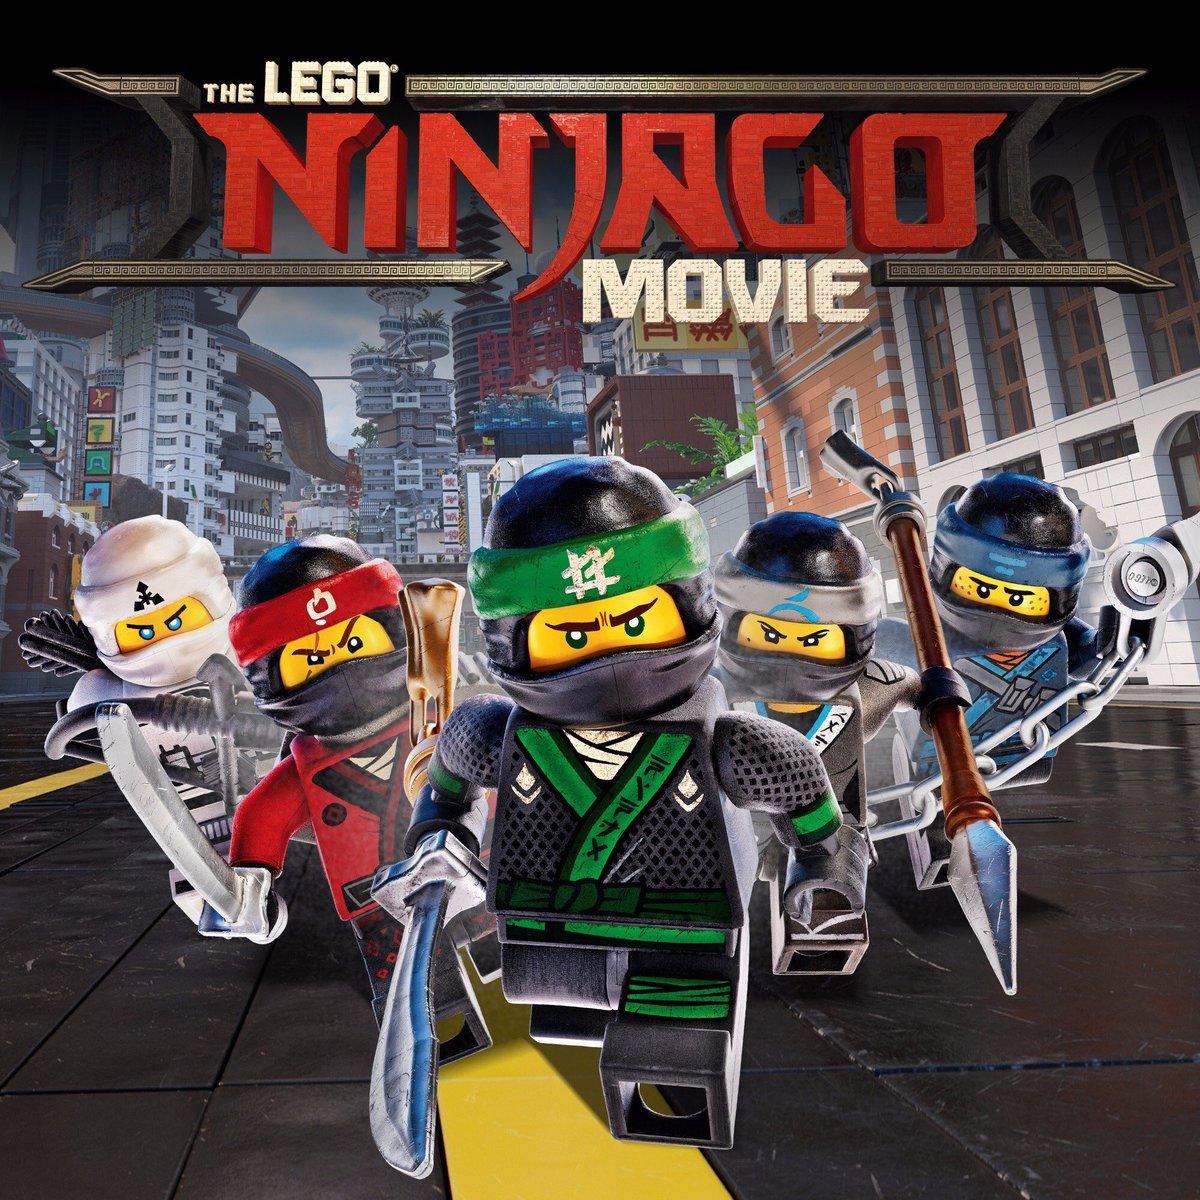 Film The Lego Ninjago Movie Bognor Regis Post